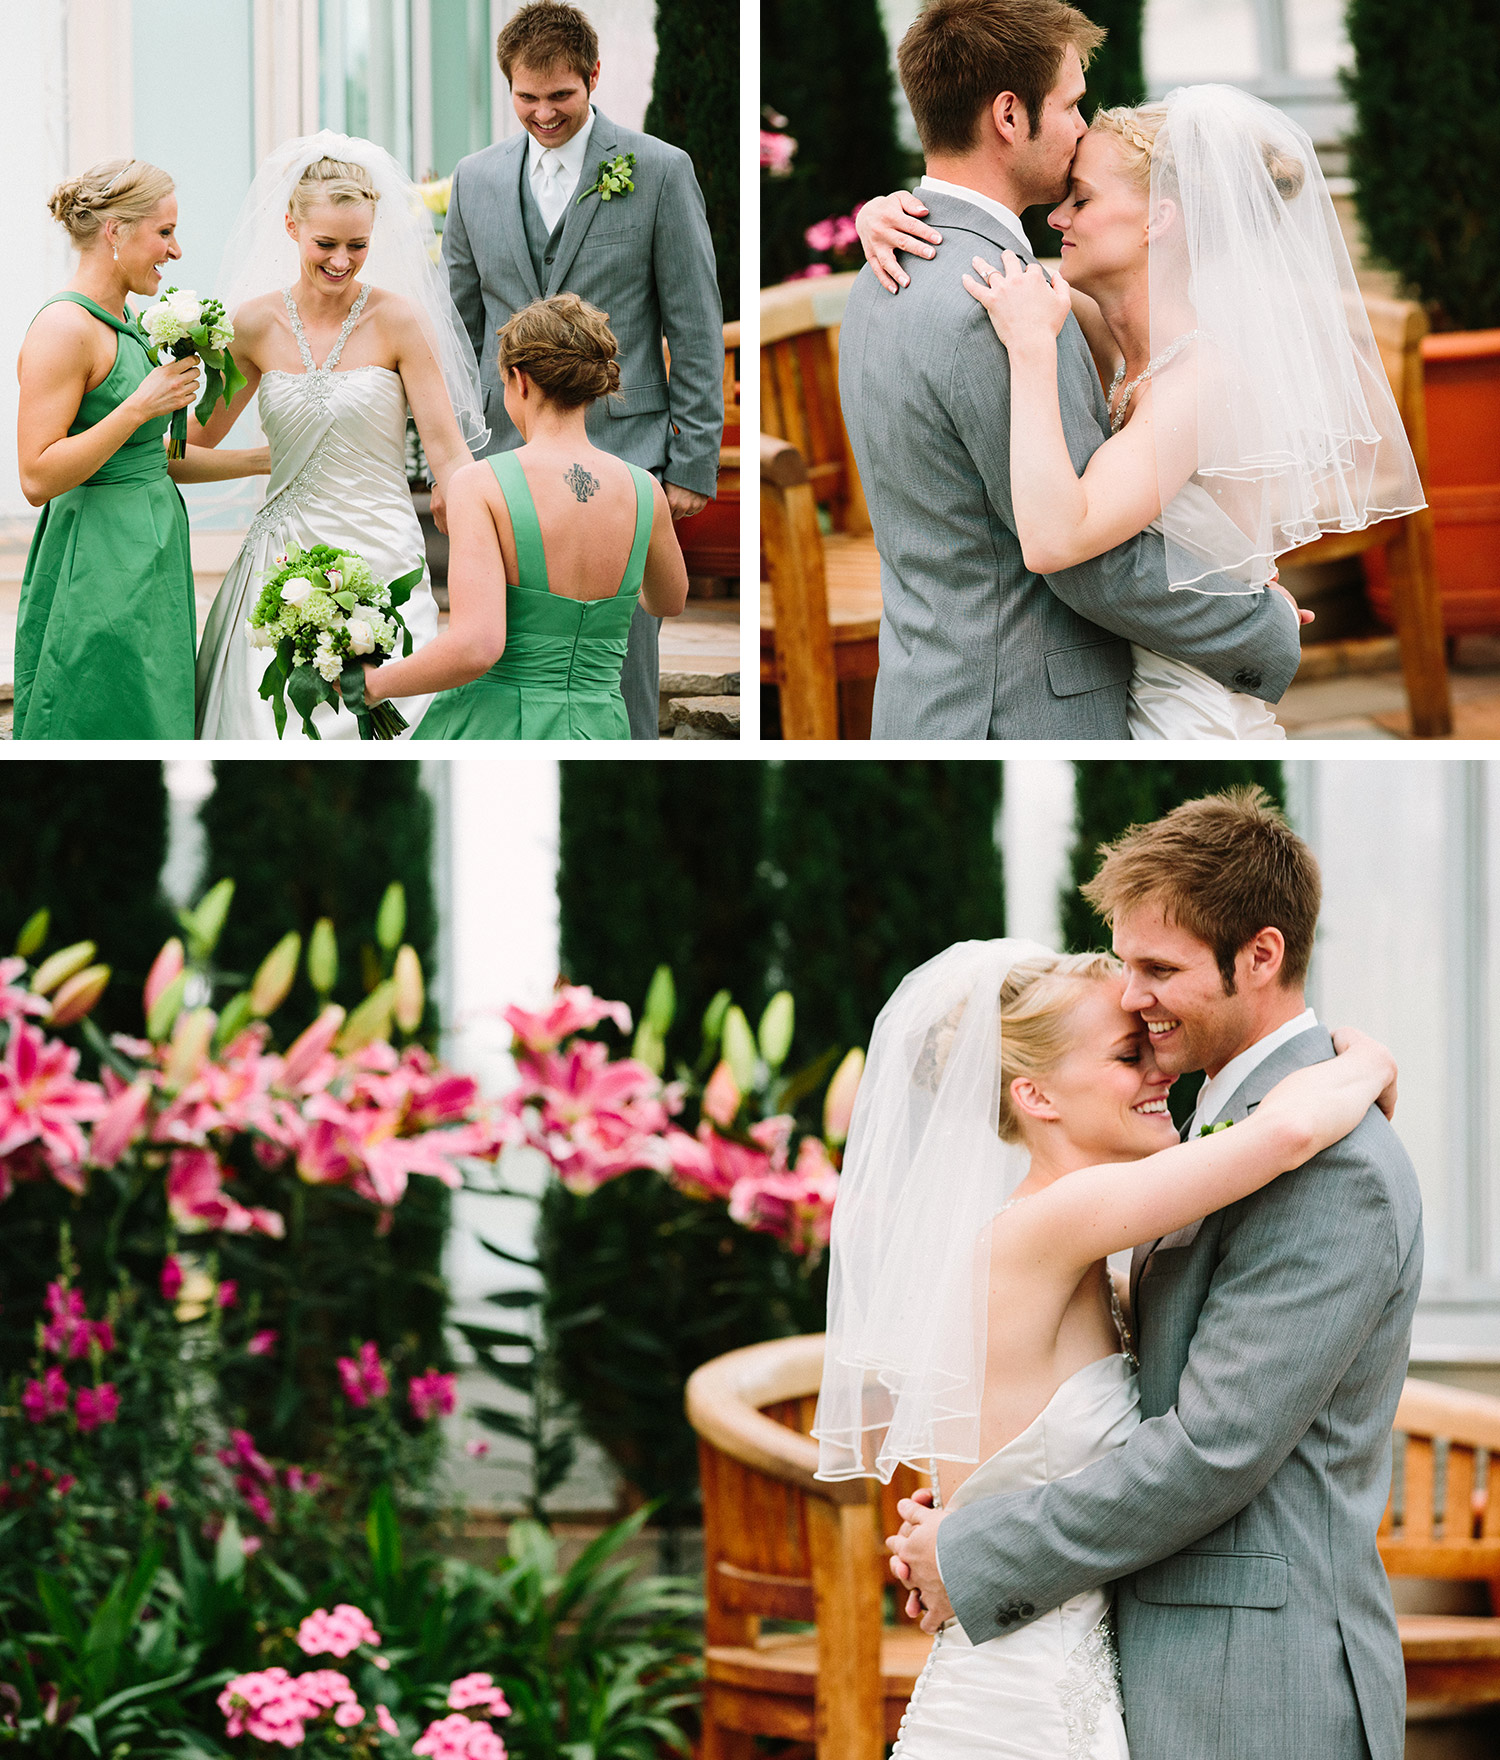 18_Saint_Paul_Hotel_Landmark_Center_wedding.jpg